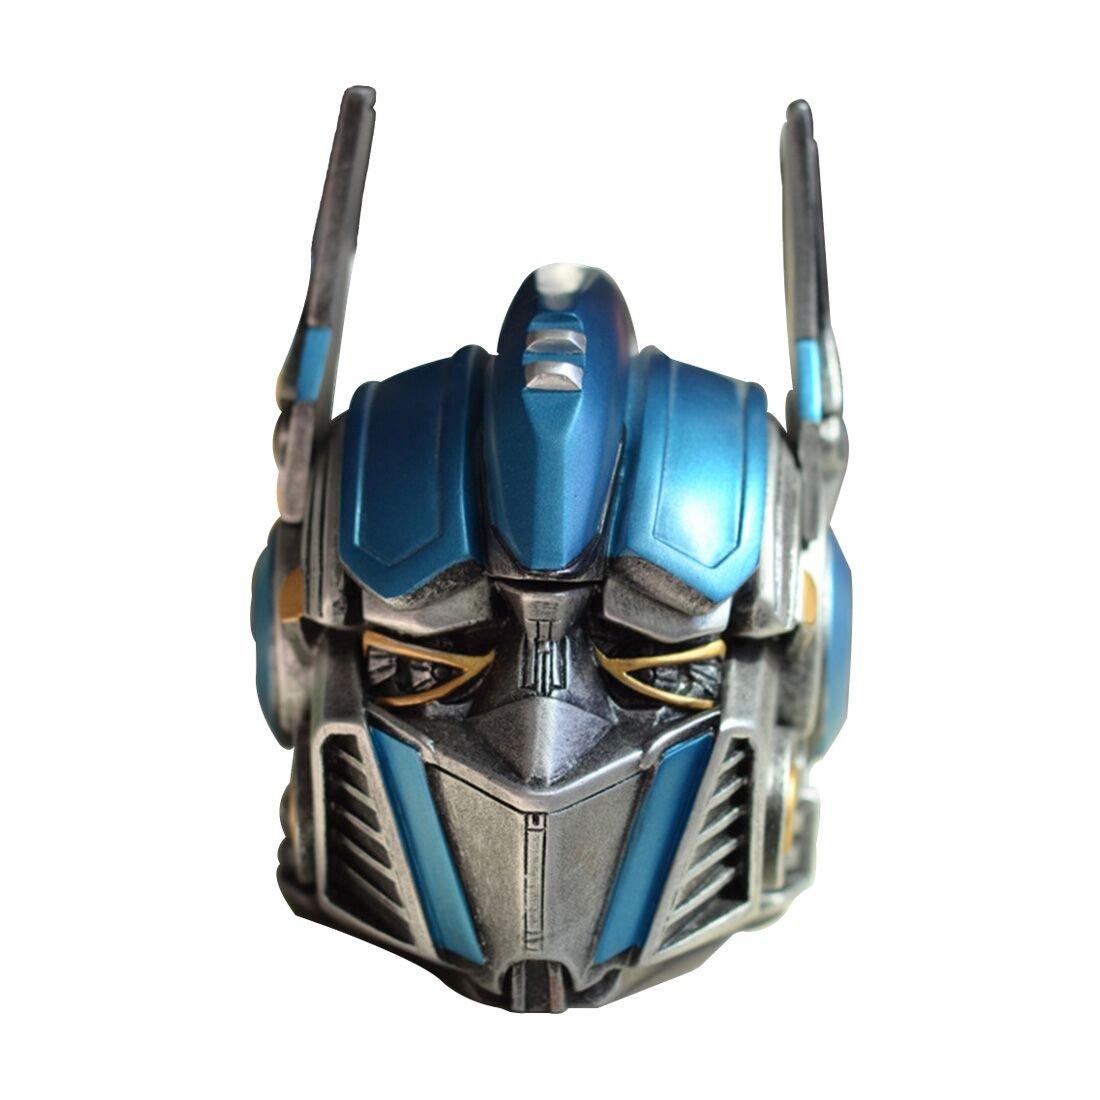 WENTAO Transformers 5 Cenicero Optimus Prime con Tapa Nuevo Modelo Exótico Artesanías De Resina Caja De Almacenamiento Modelo Decoración [Clase de eficiencia energética A]